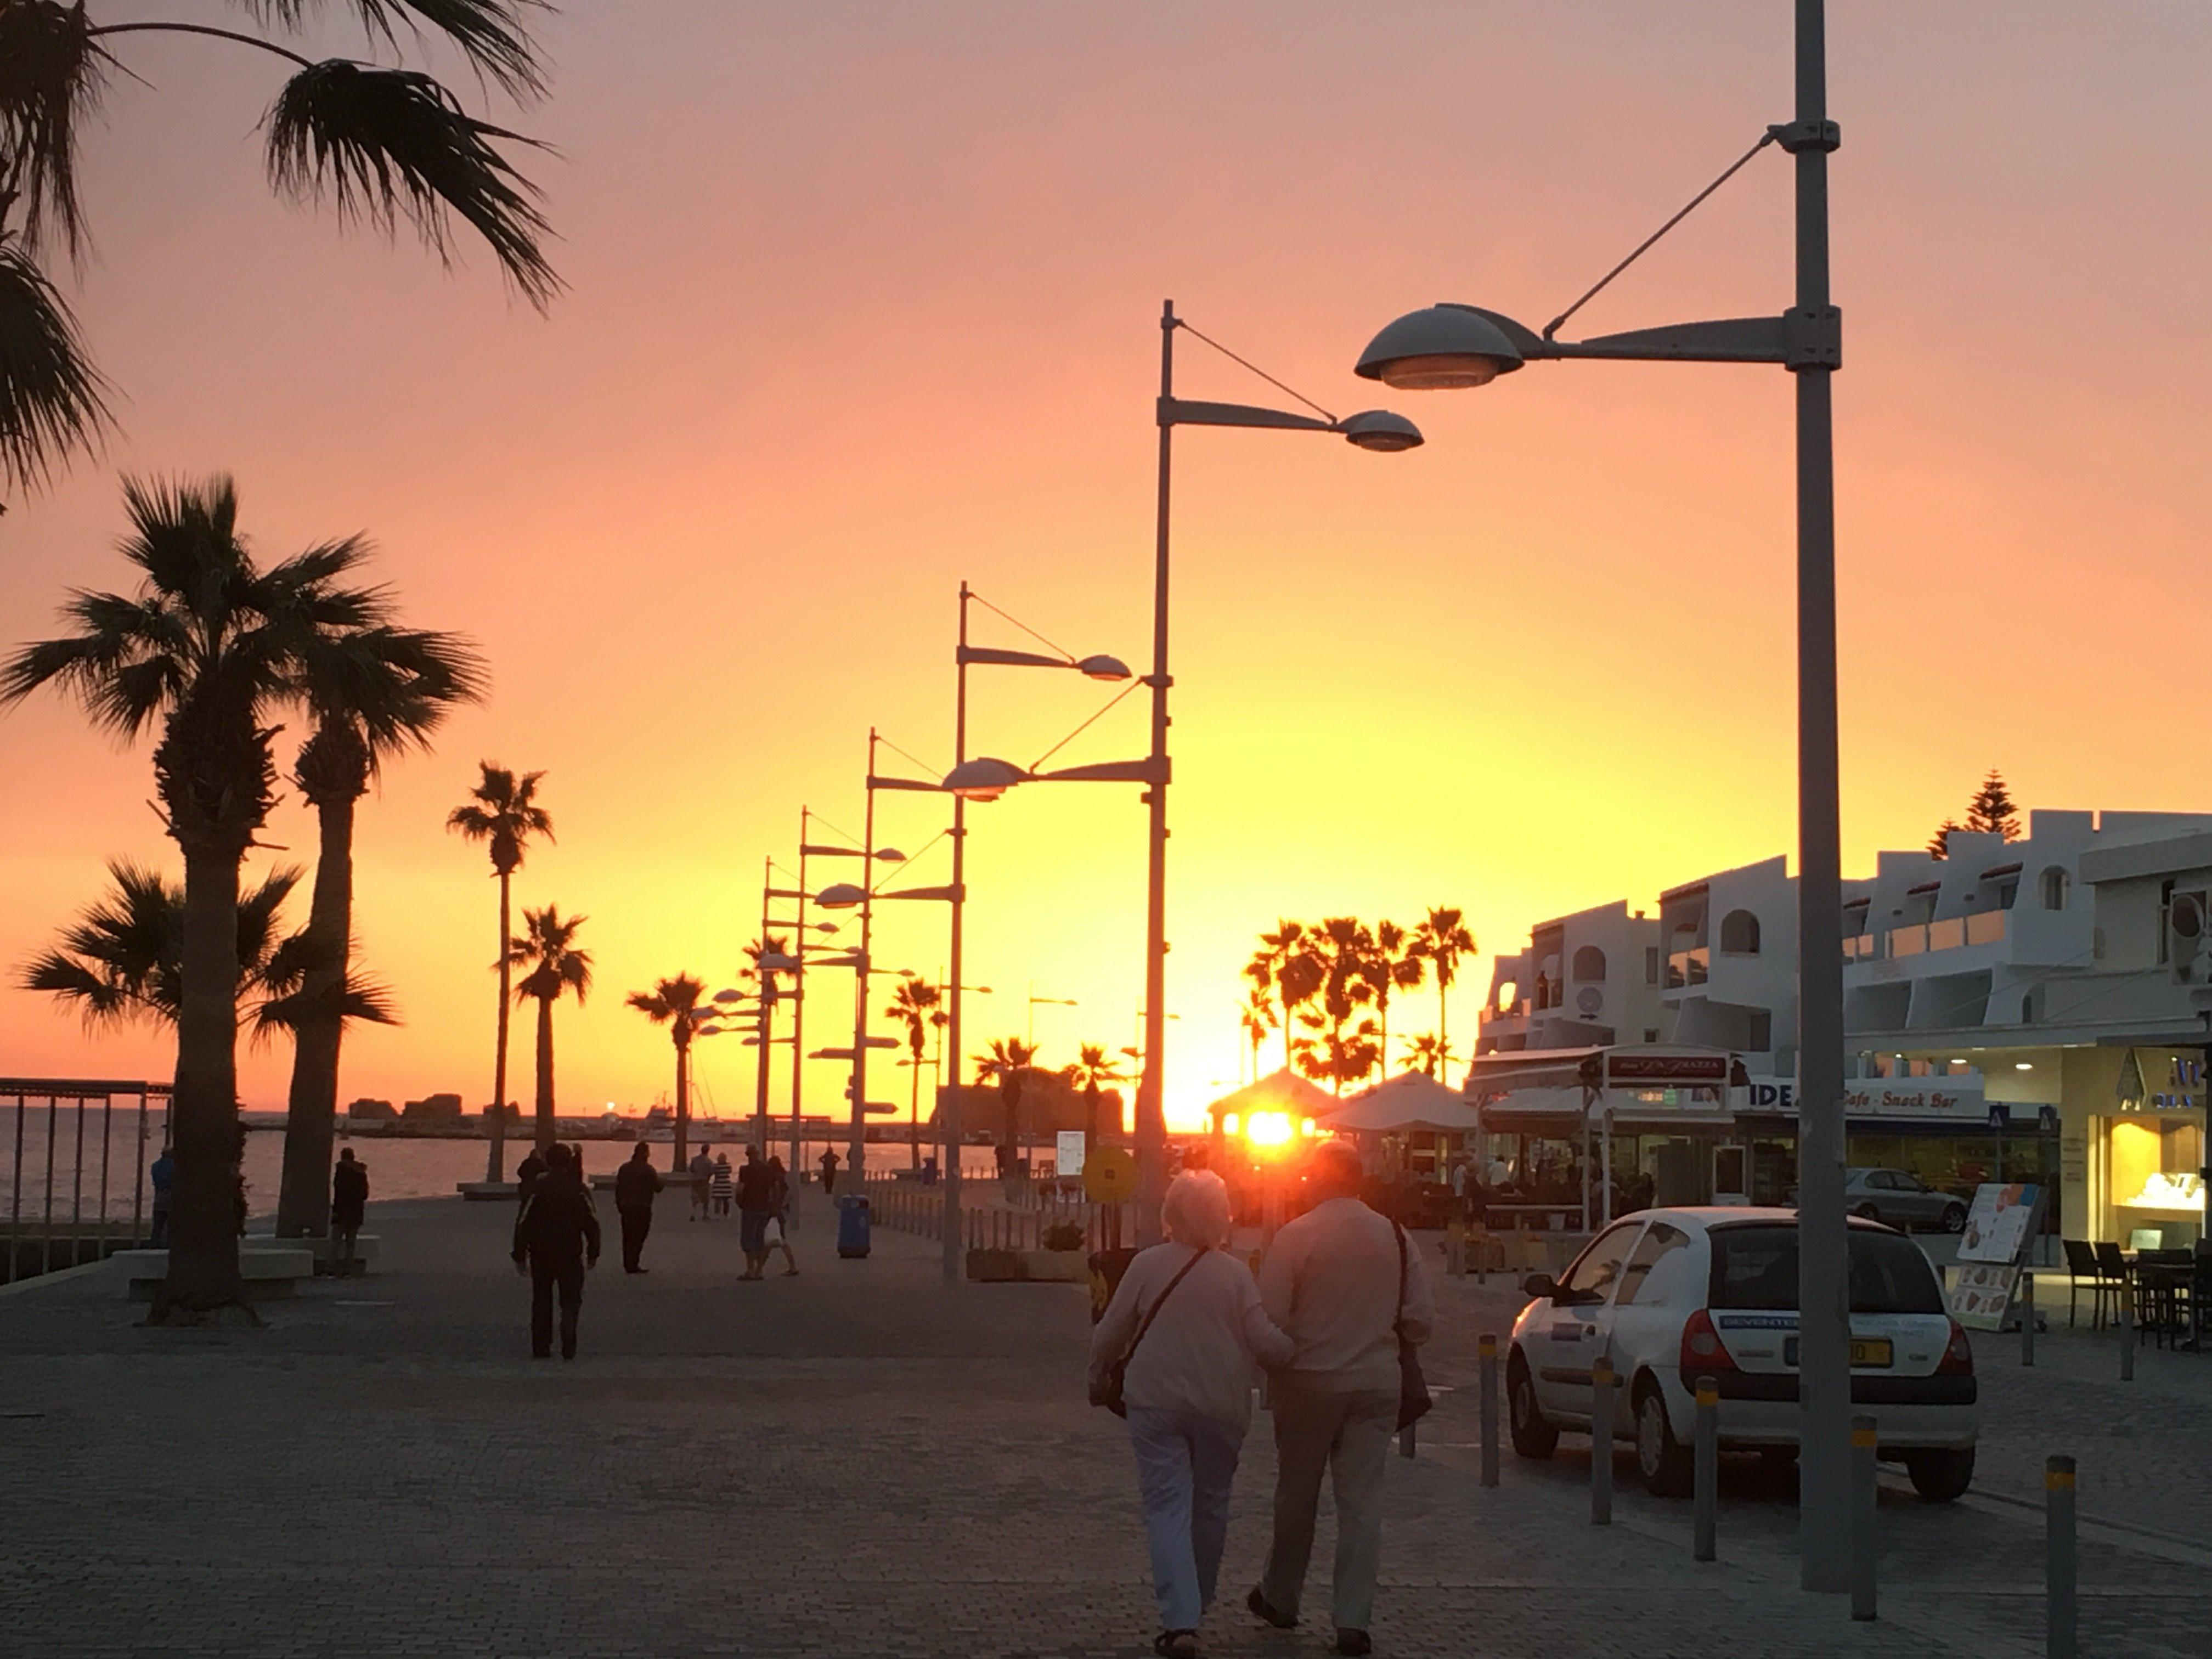 Cyprus almyra hotel spa aahhhh livmayfar for A beautiful addiction tanning salon